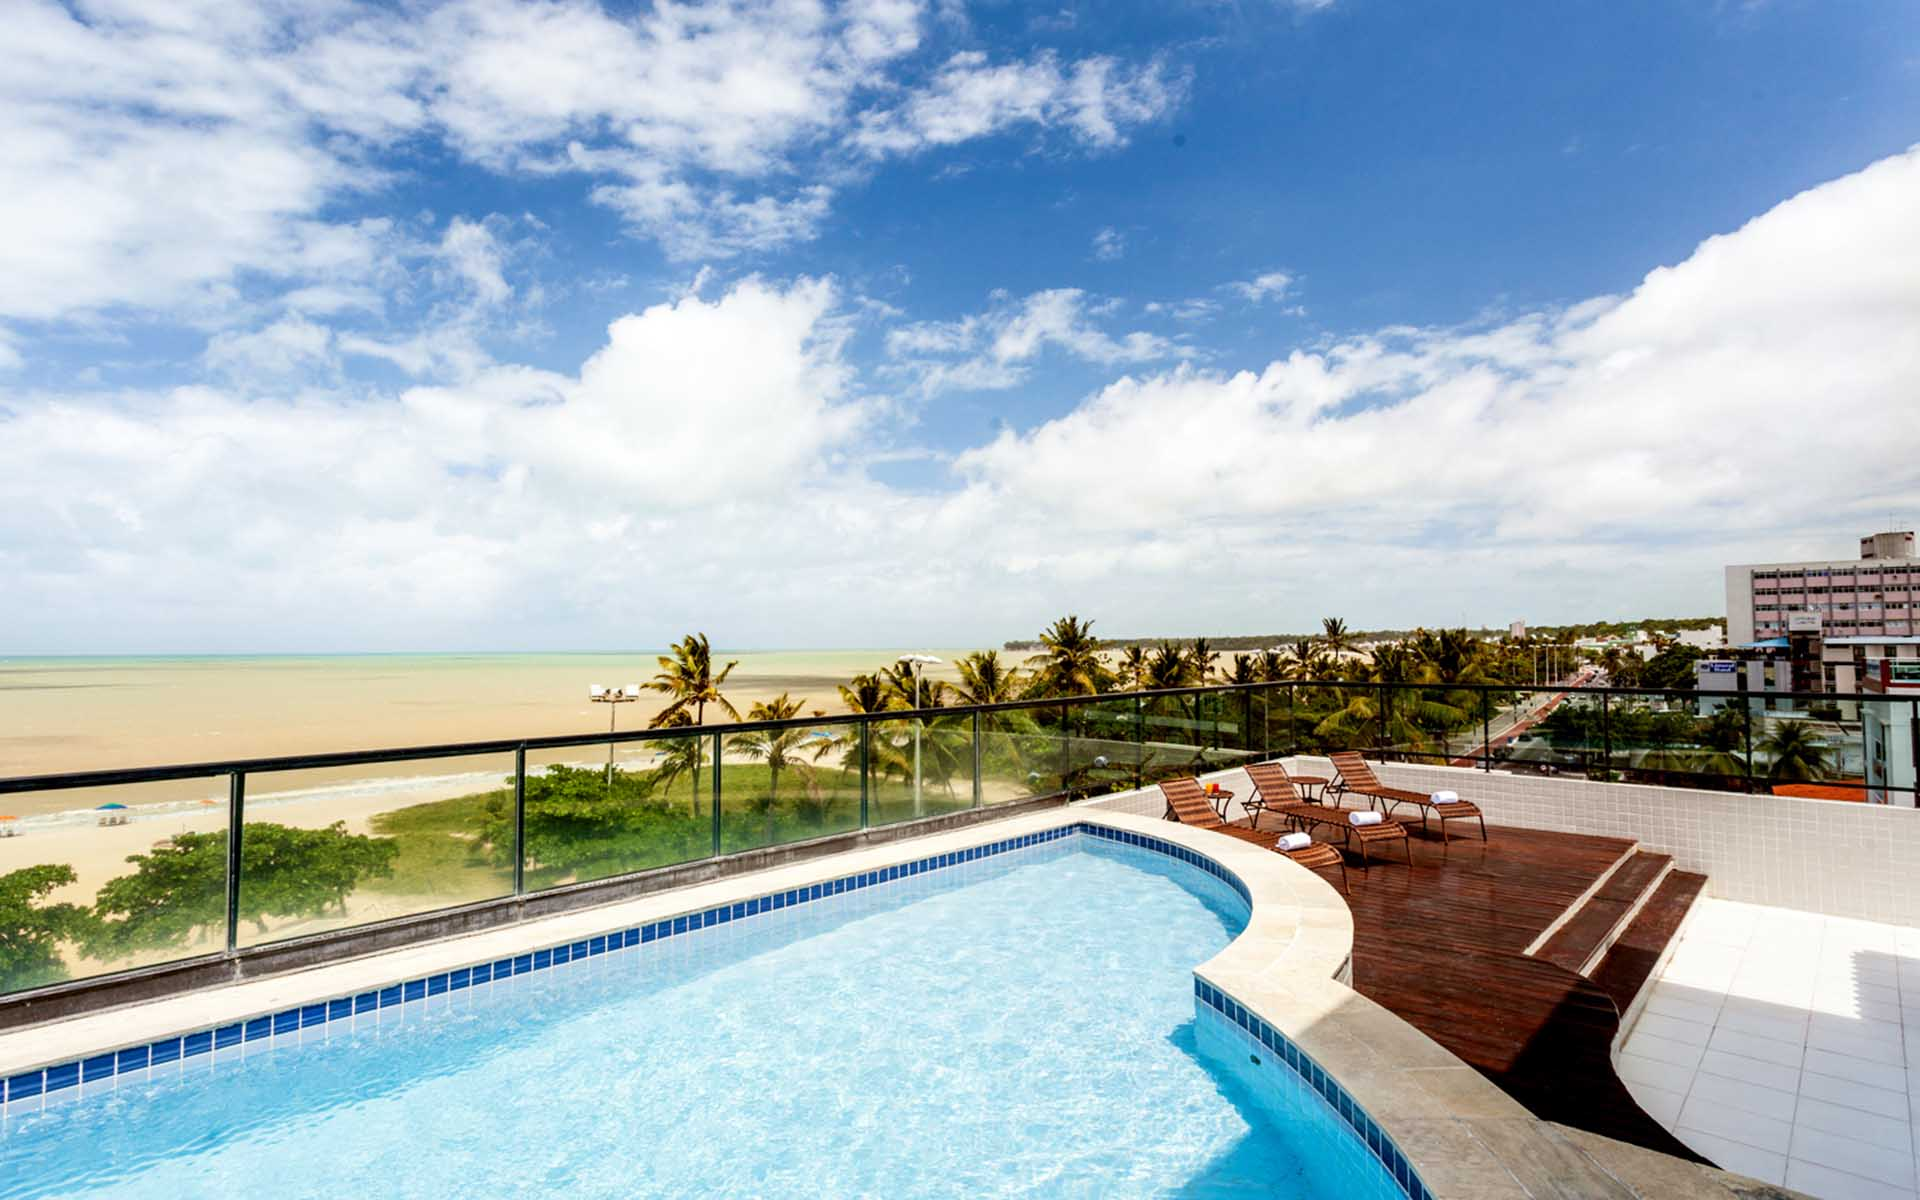 piscina_hotel_joao_pessoa_hplus_beach (16)